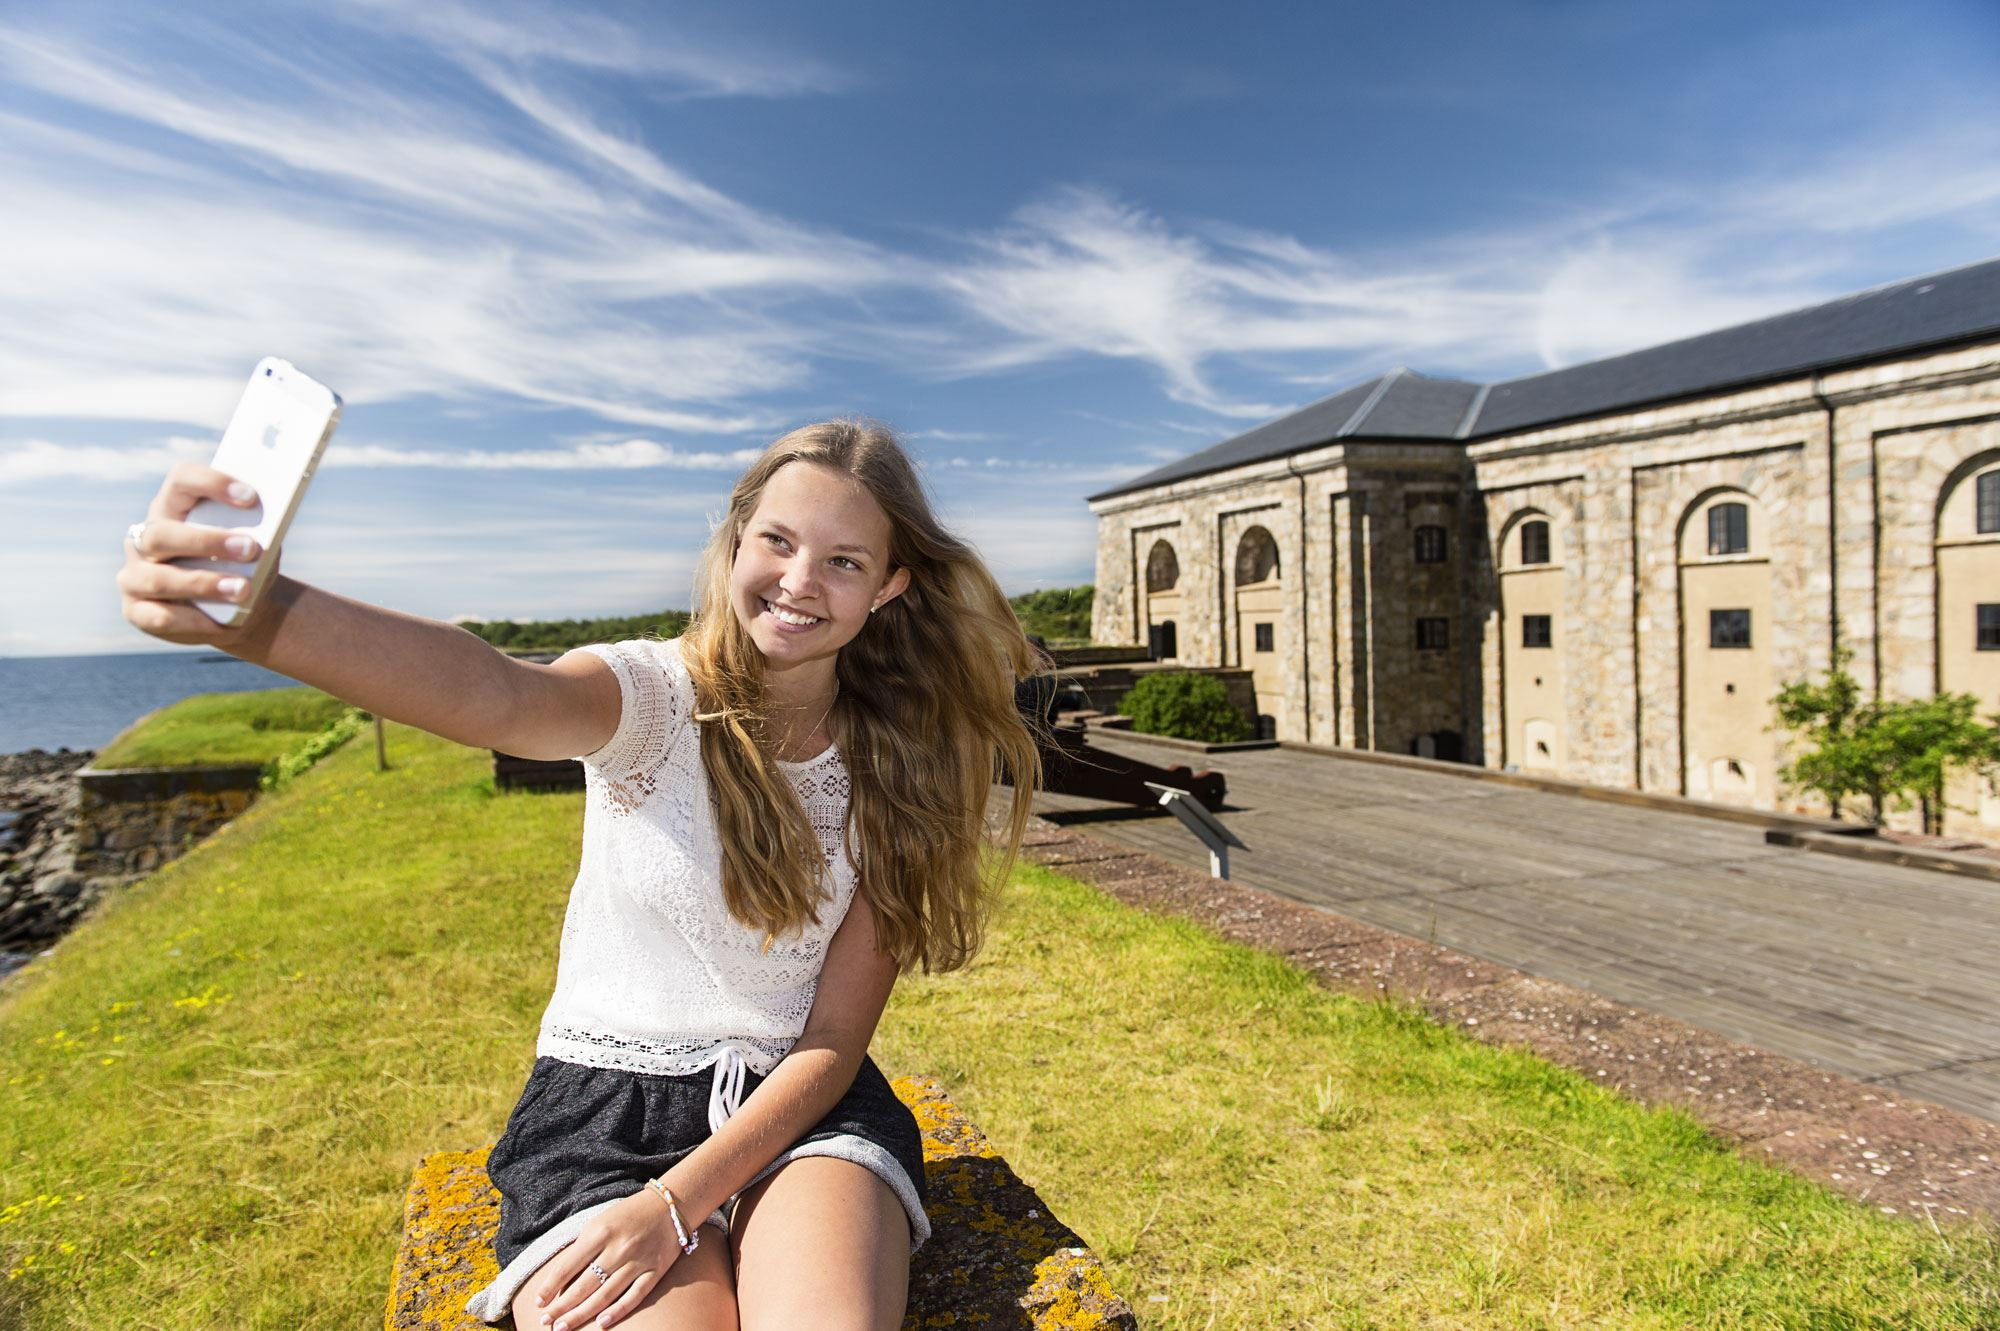 Guided tour - The Drottningskärs Citadel